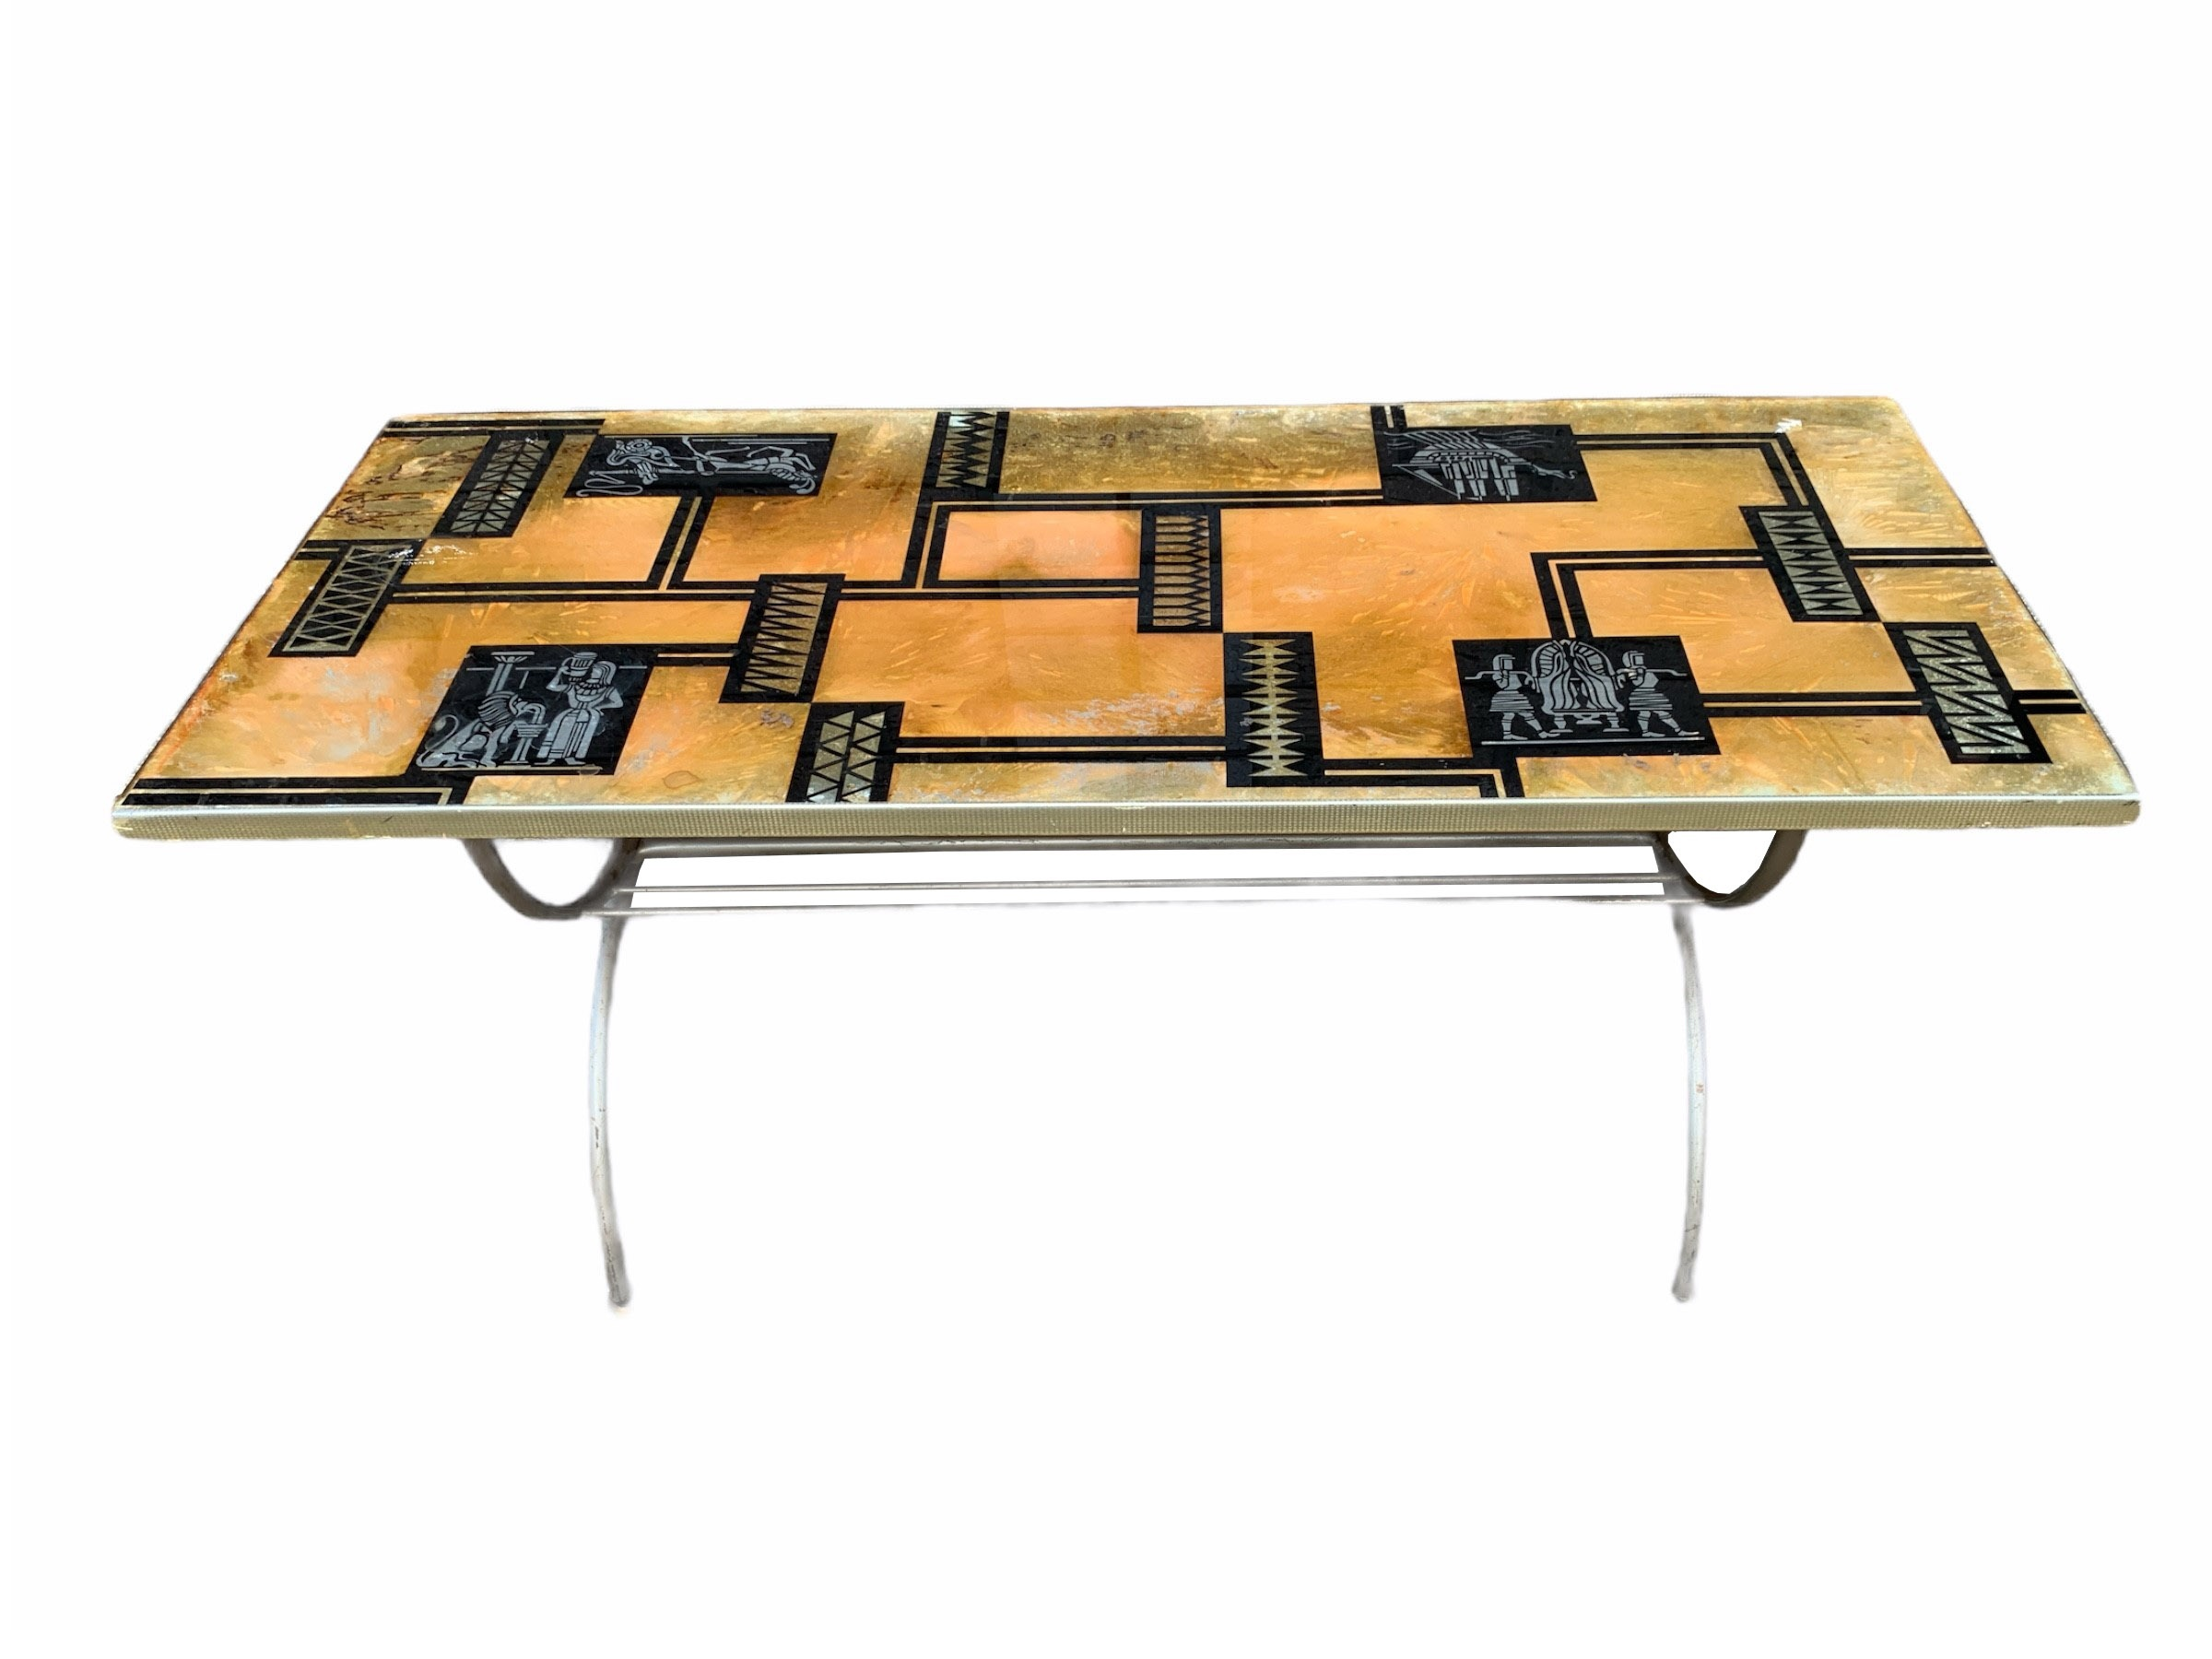 A DECORATIVE MID CENTURY COFFEE TABLE. (h 43cm x d 44.5cm x w 105.5cm)